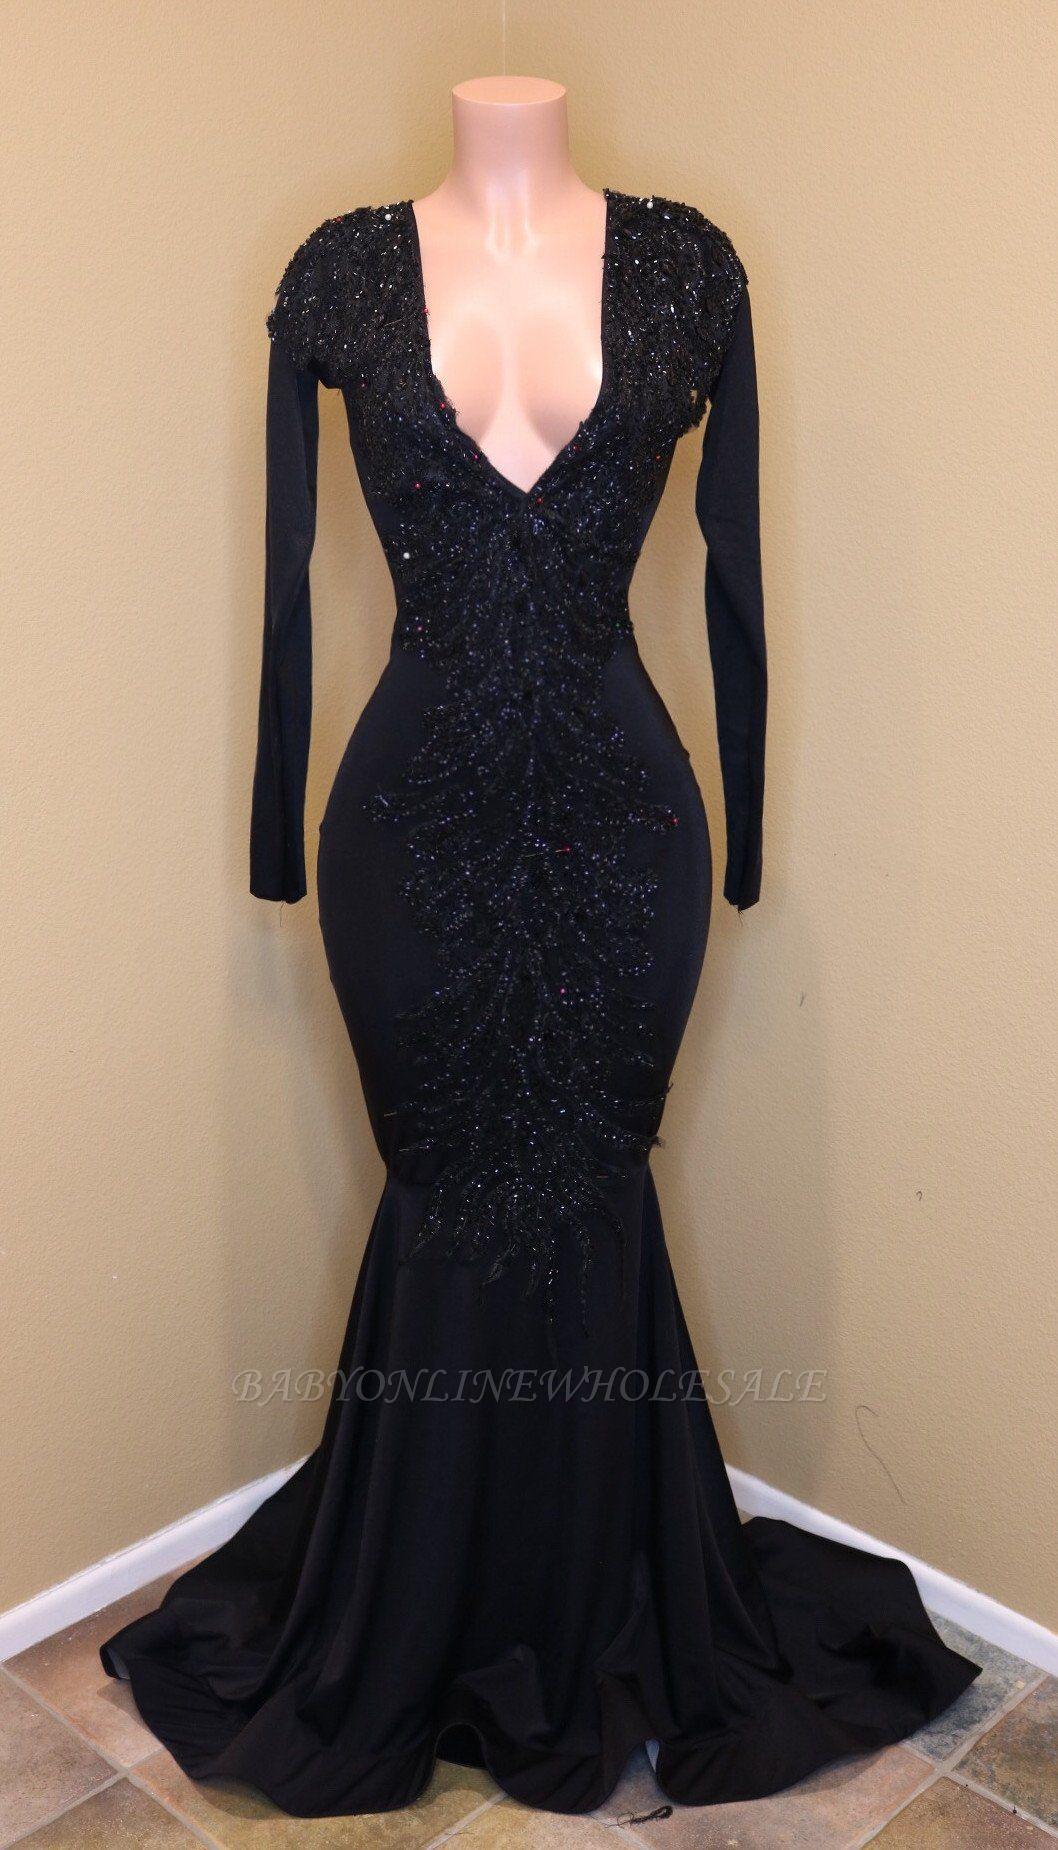 Elegante V-Ausschnitt mit langen Ärmeln Applikationen Pailletten Mermaid Zipper Prom Dresses